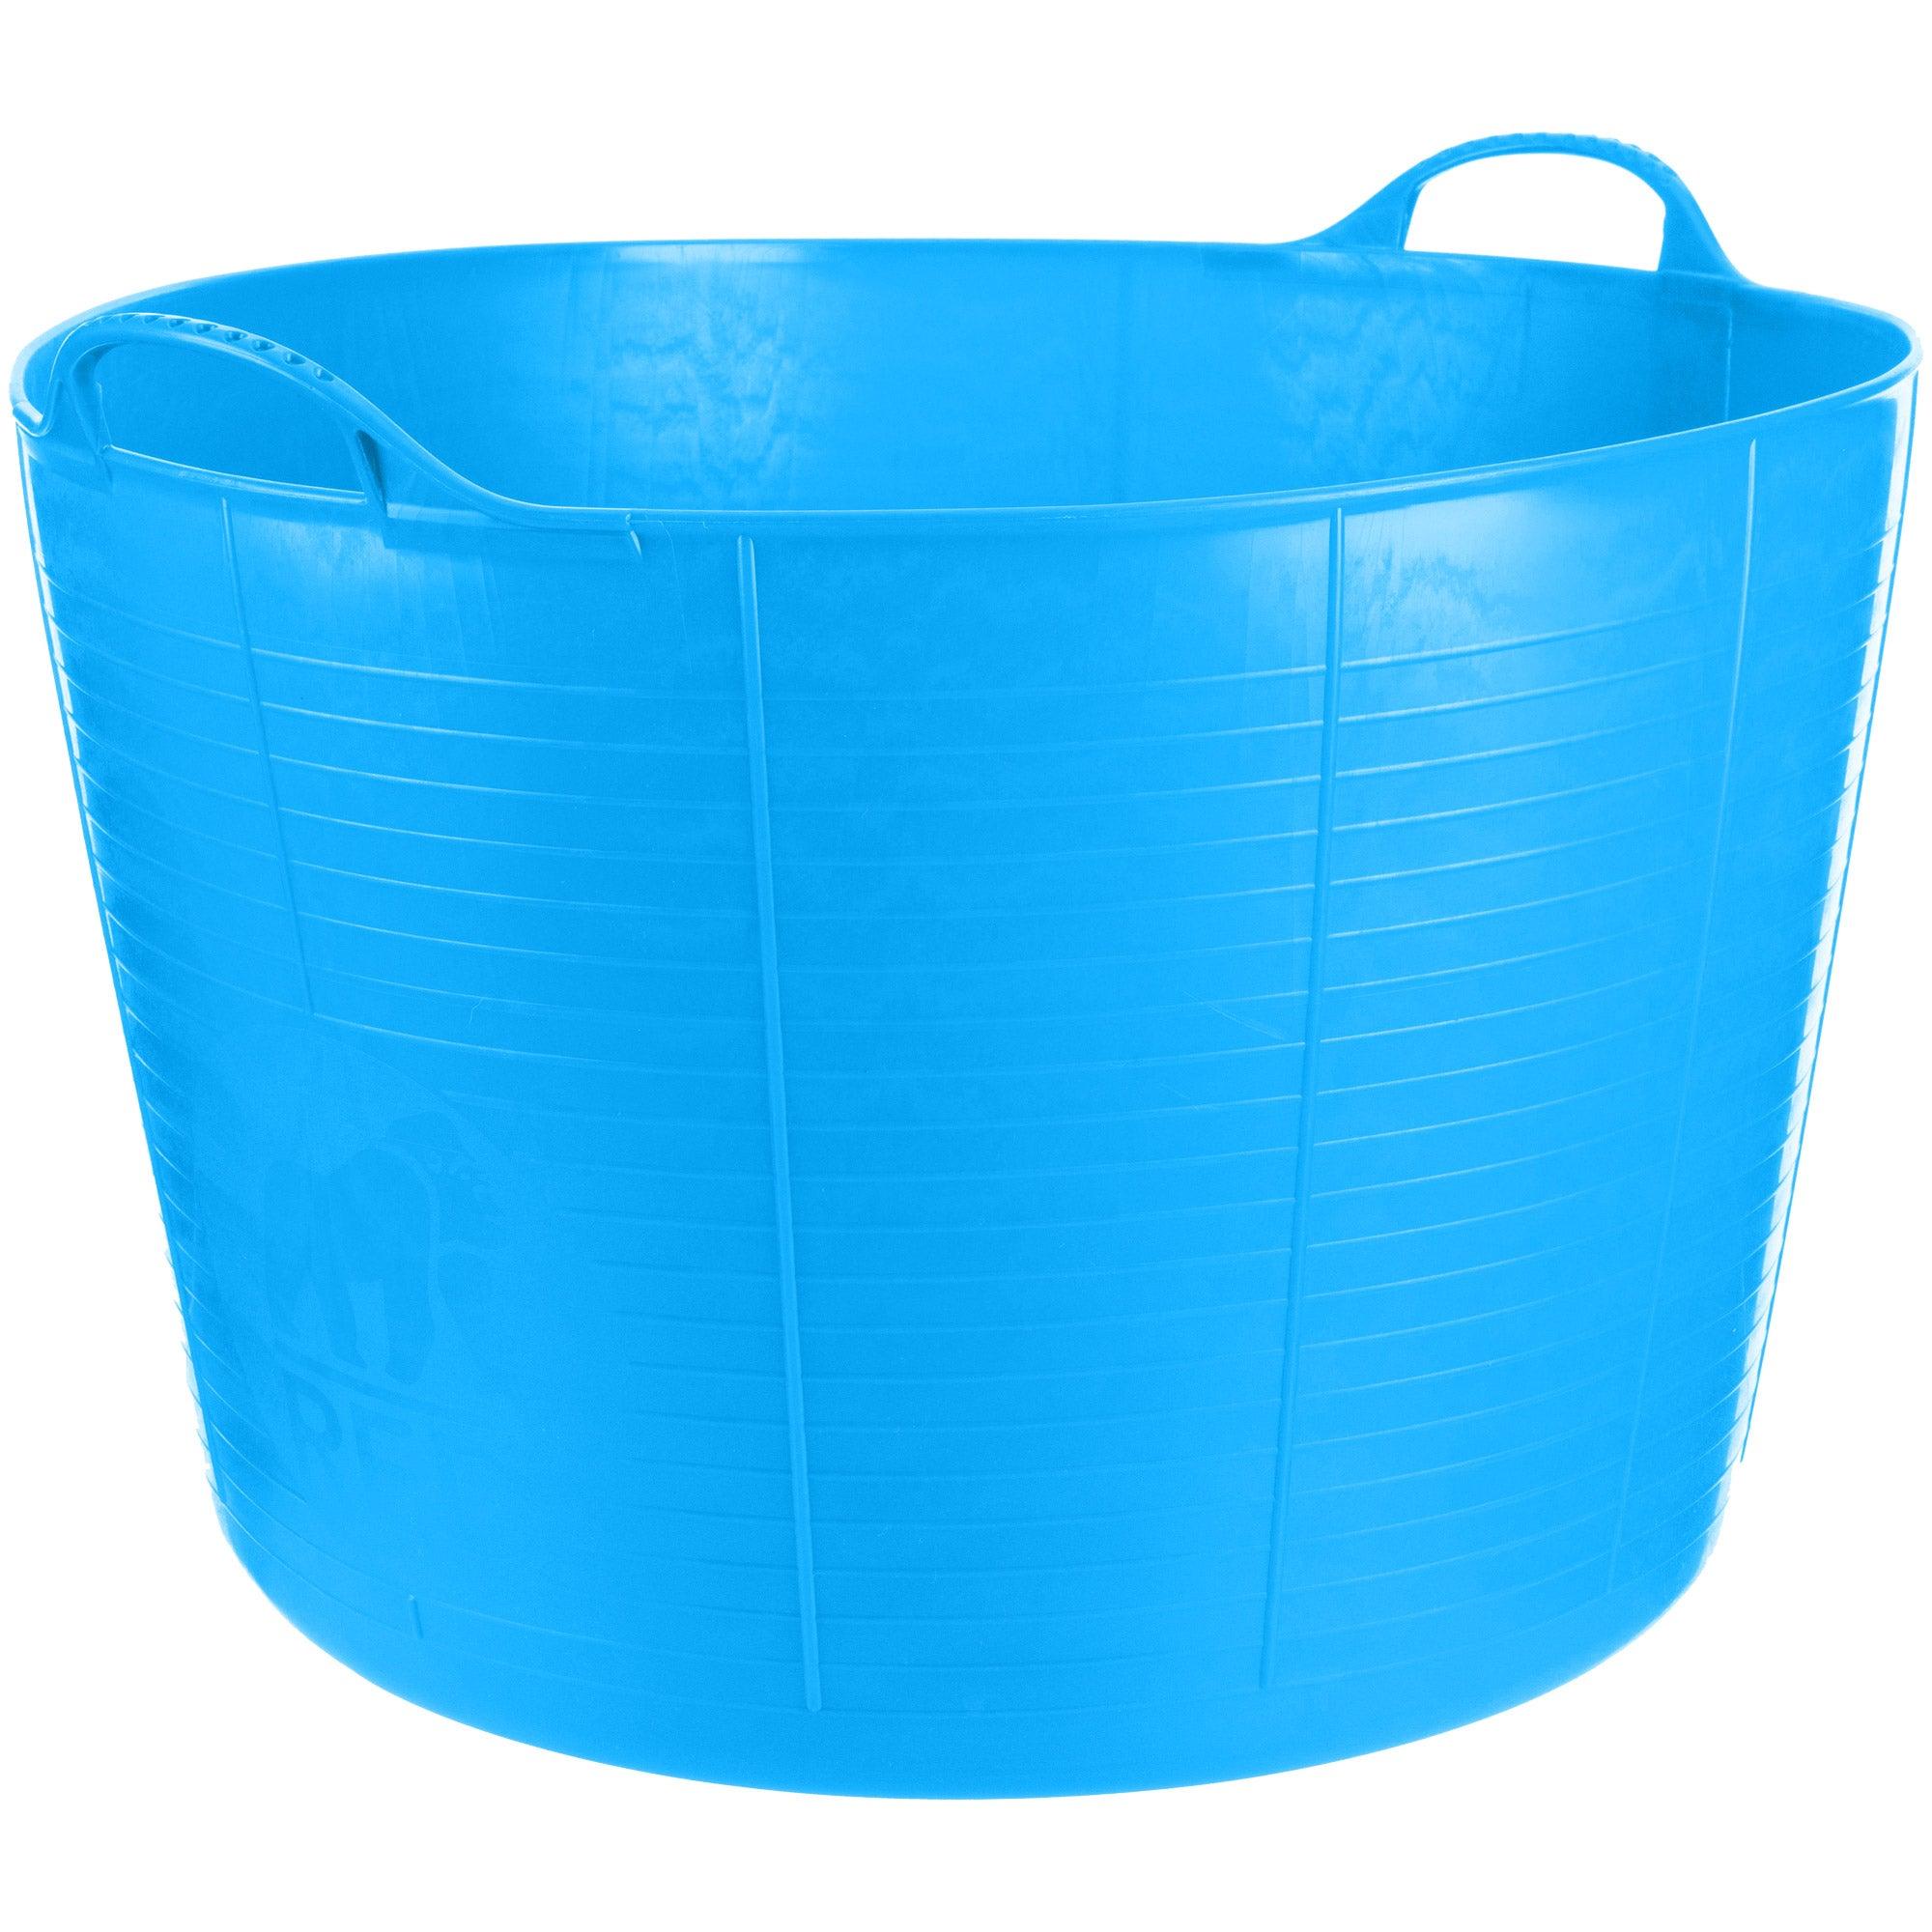 Red Gorilla Tubtop Bucket Cover